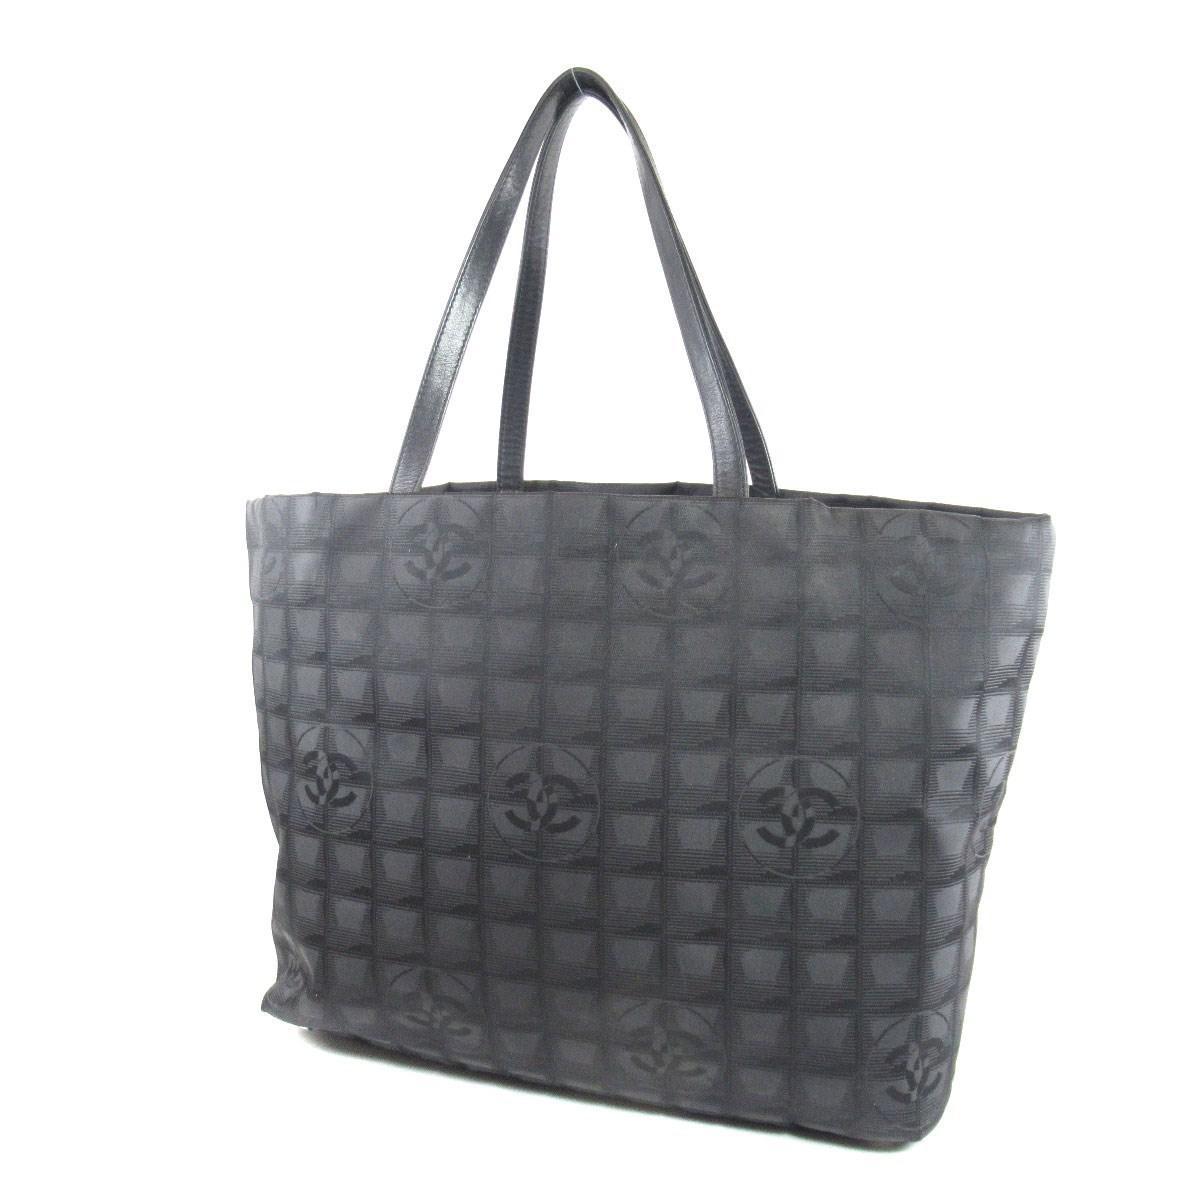 96715777839 Lyst - Chanel Nylon Jacquard Tote Bag New Travel Line Mm in Black